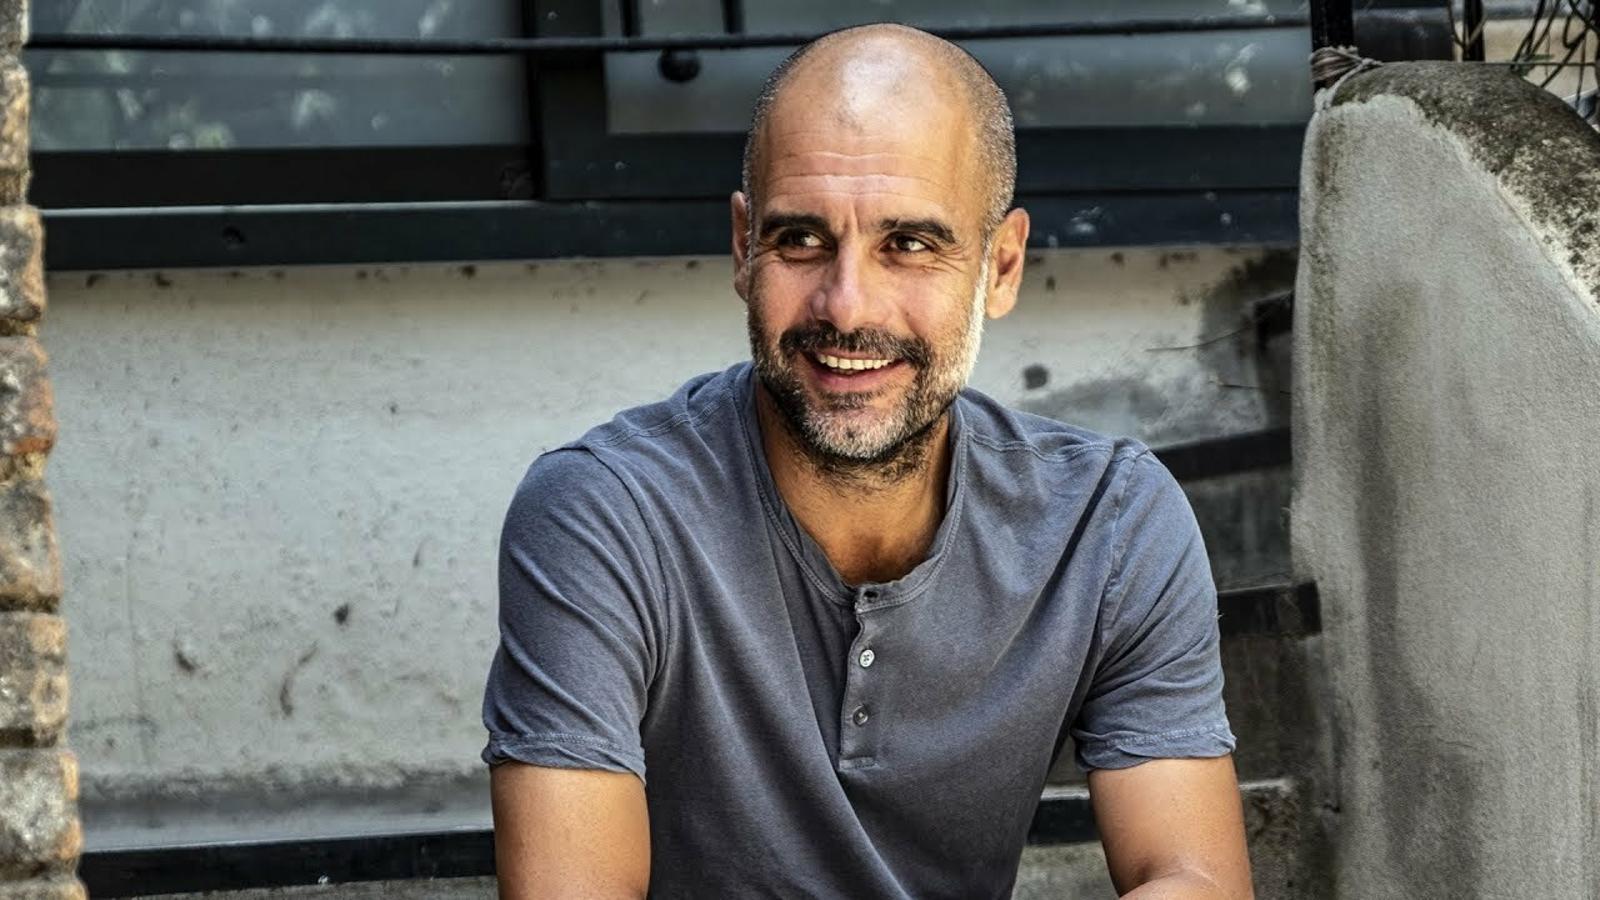 Entrevista a Pep Guardiola, Entrenador del Manchester City